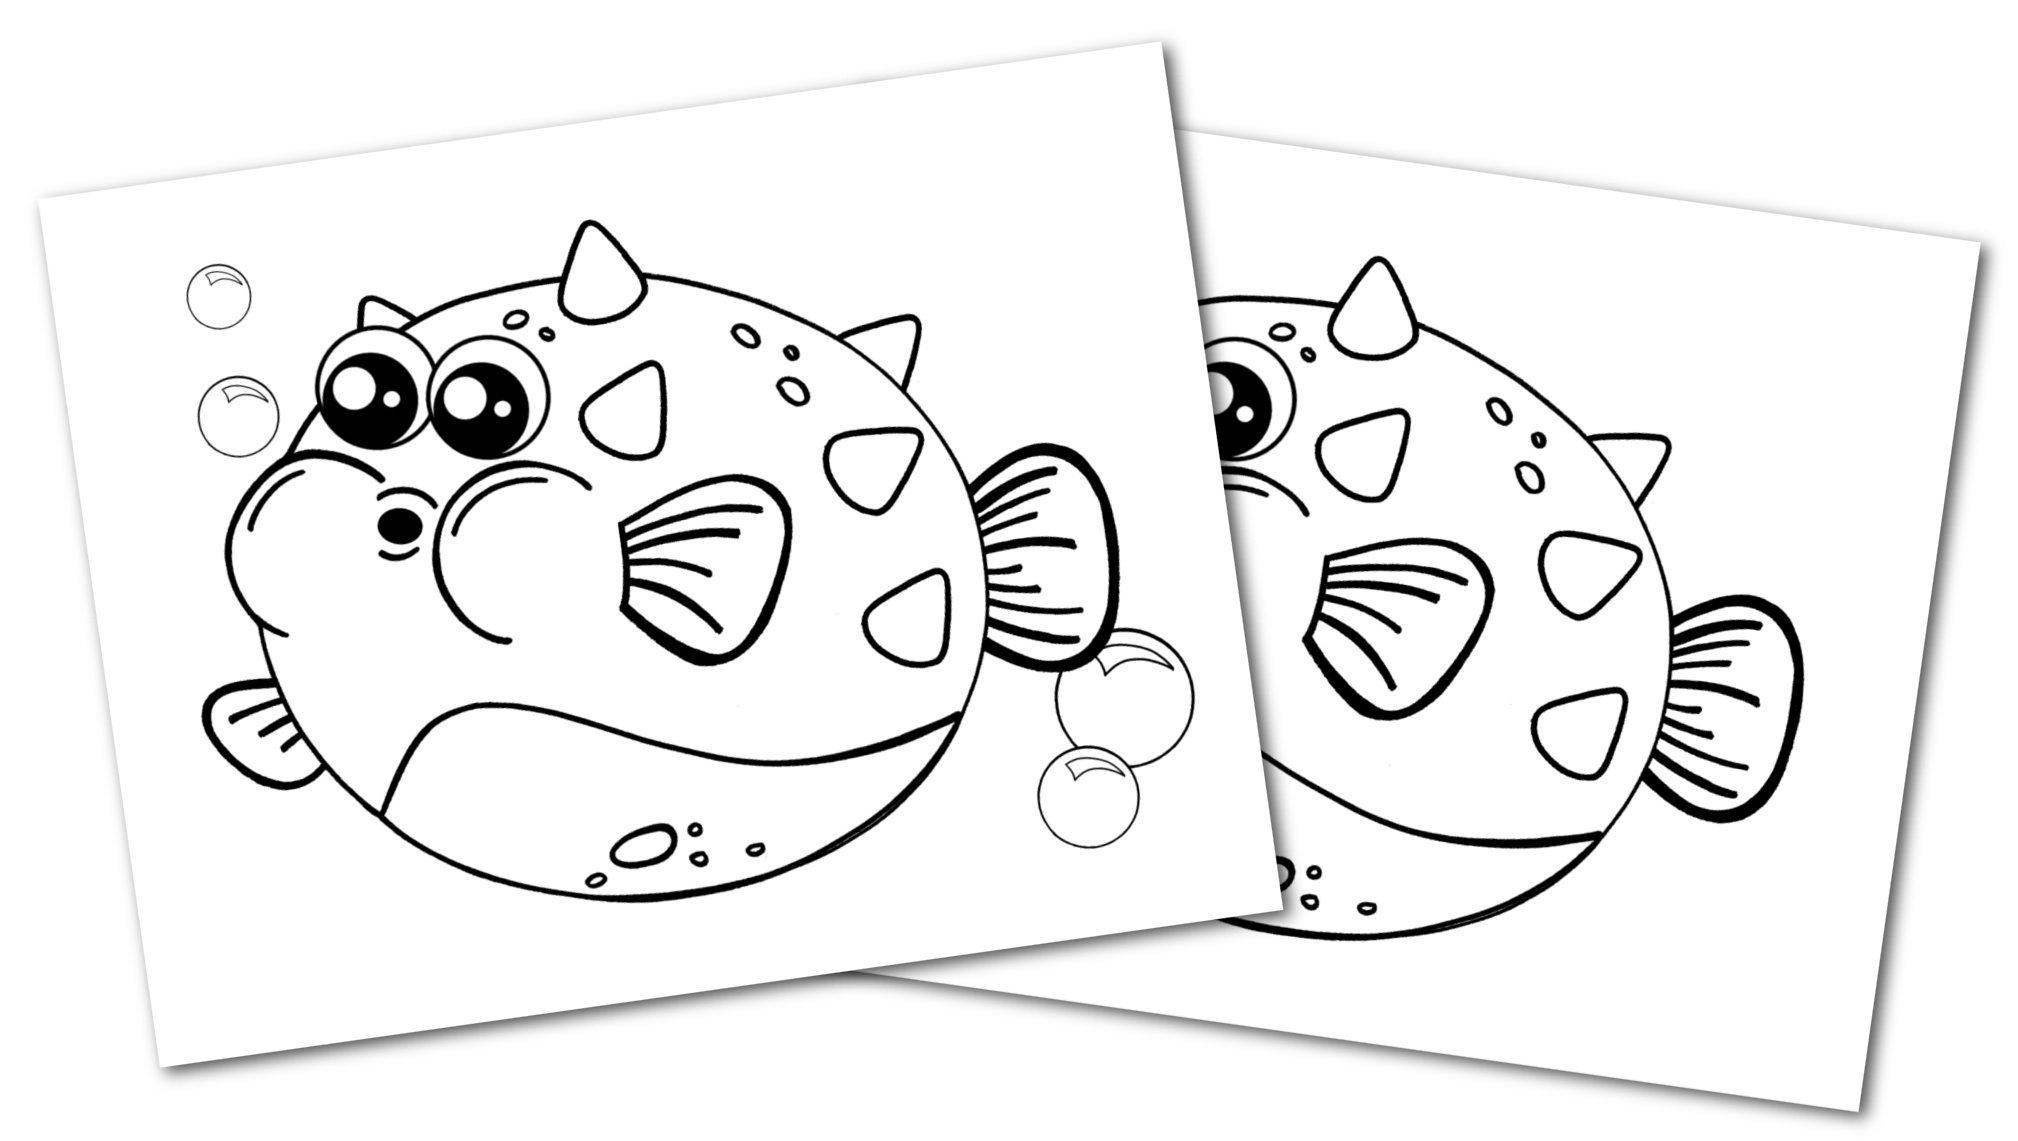 Free Printable Blowfish Ocean Animal Convertkit for Toddlers, Kids and Preschoolers